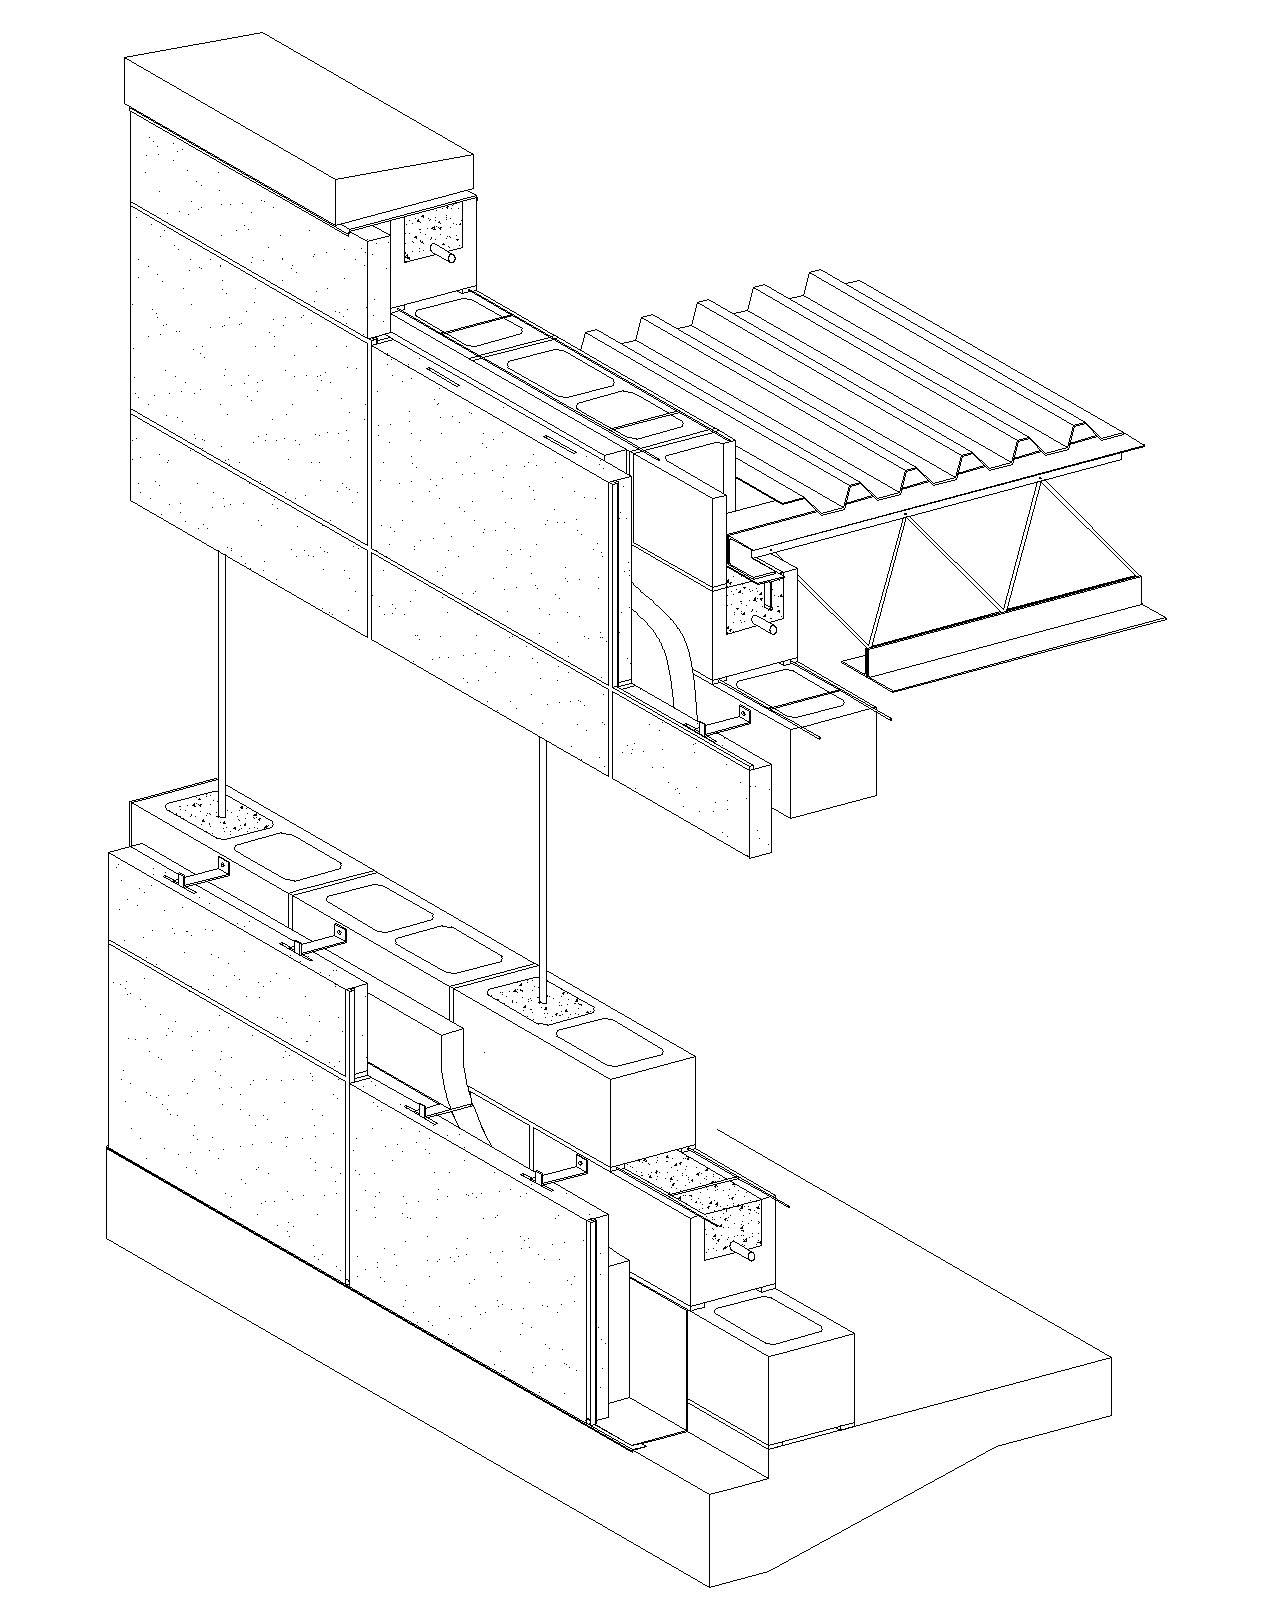 Cavity Wall Stone Slab Veneer Reinforced Concrete Block Jpg 1280 1600 Wall Section Detail Concrete Block Walls Concrete Wall